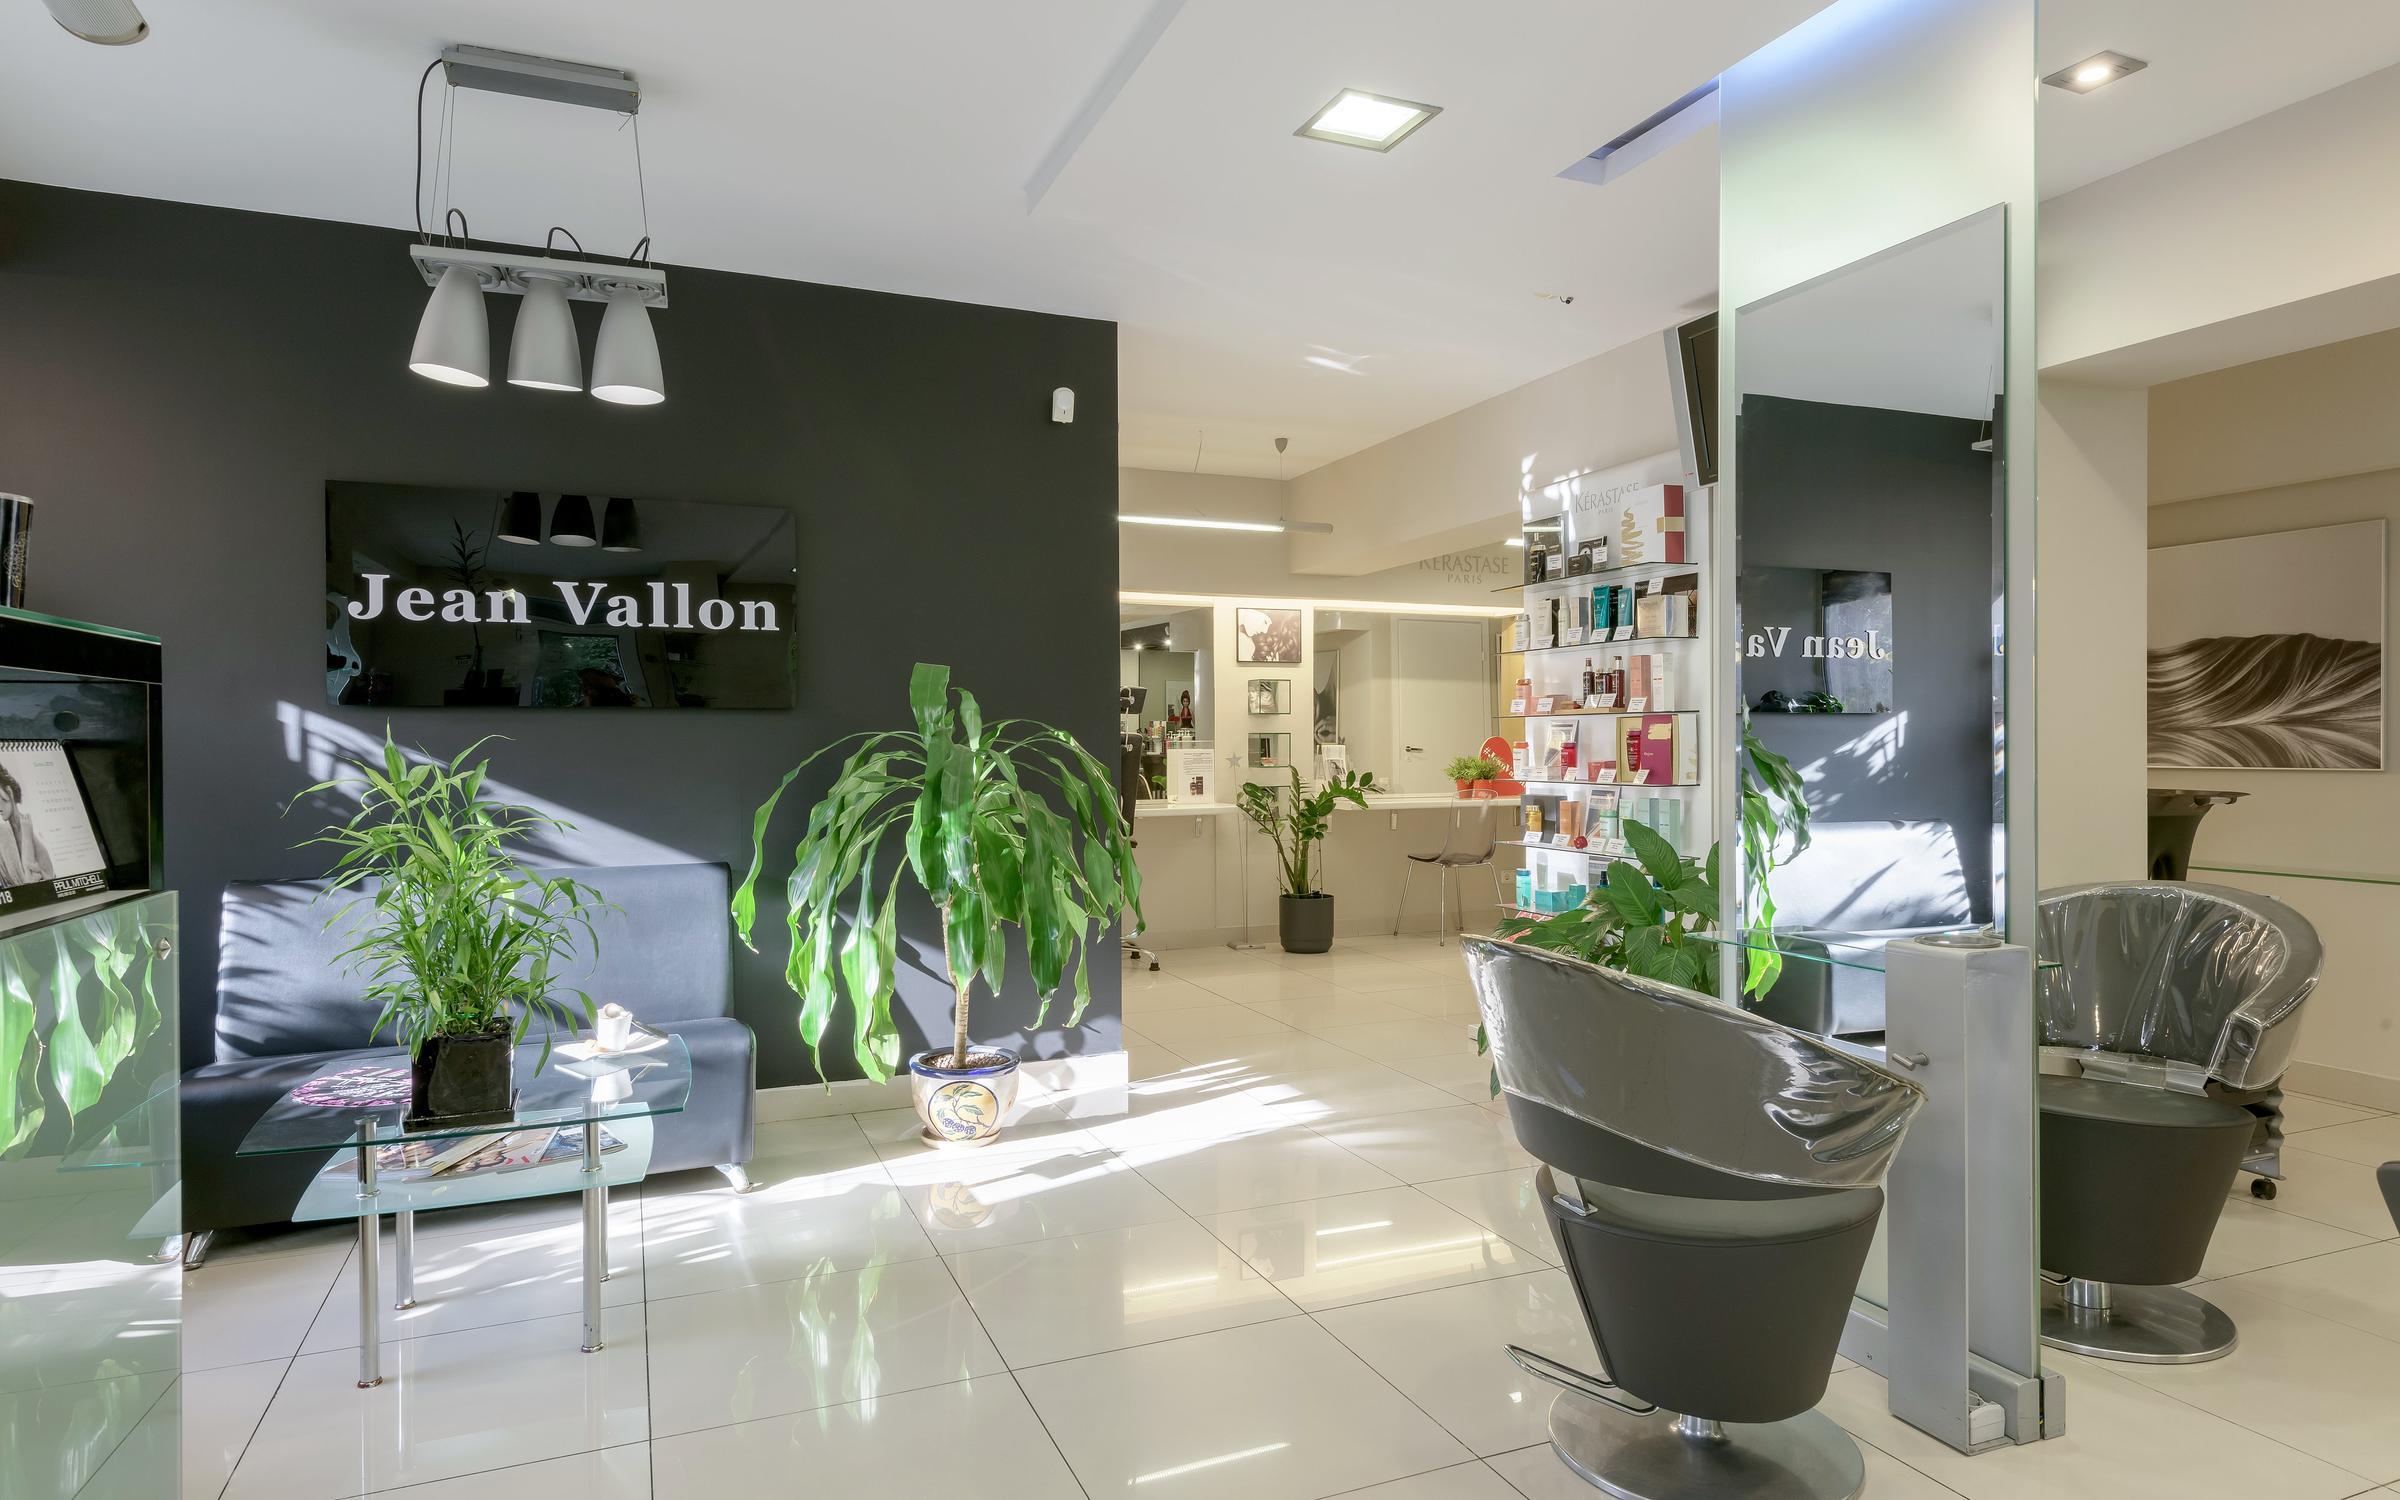 фотография Салона красоты Jean Vallon на метро Площадь Восстания